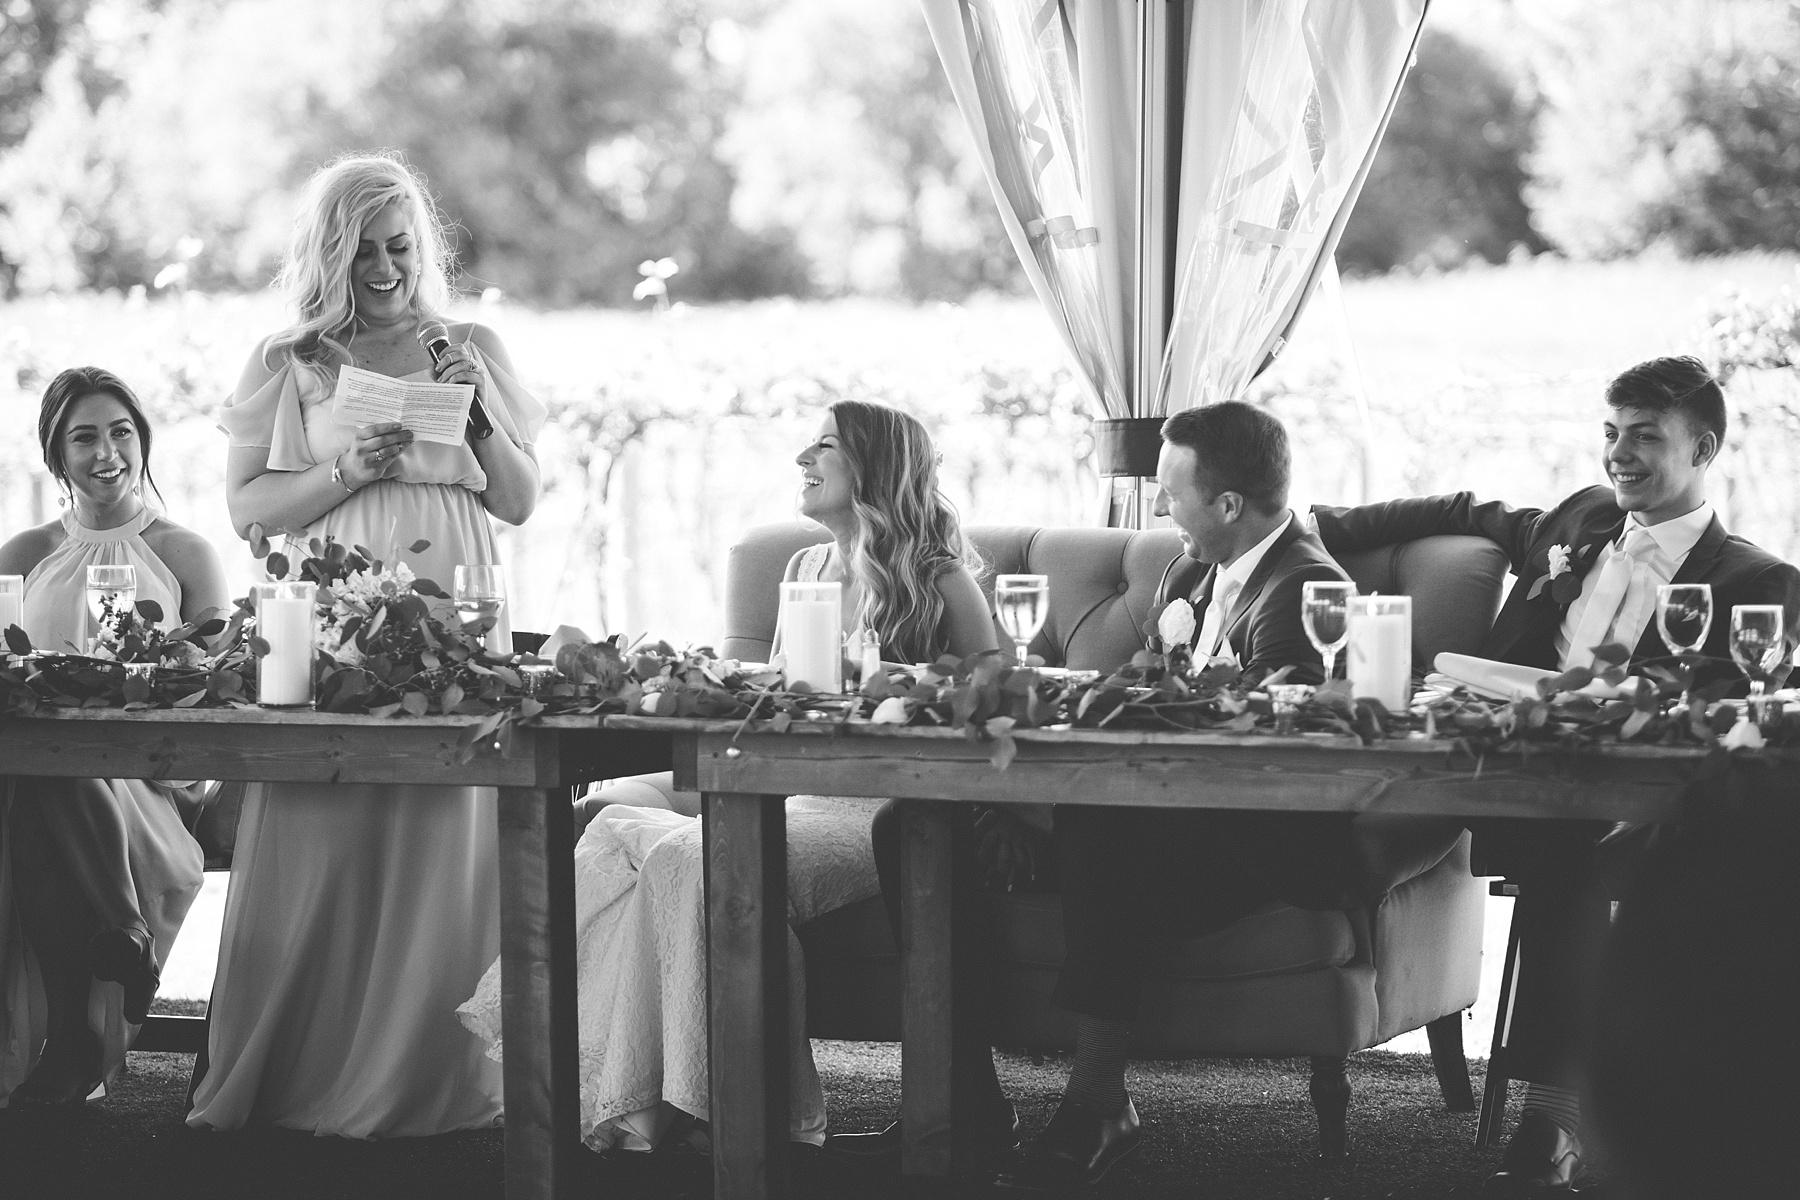 Brandon_Shafer_Photography_Kara_Doug_12_corners_Wedding_Benton_Harbor_0058.jpg